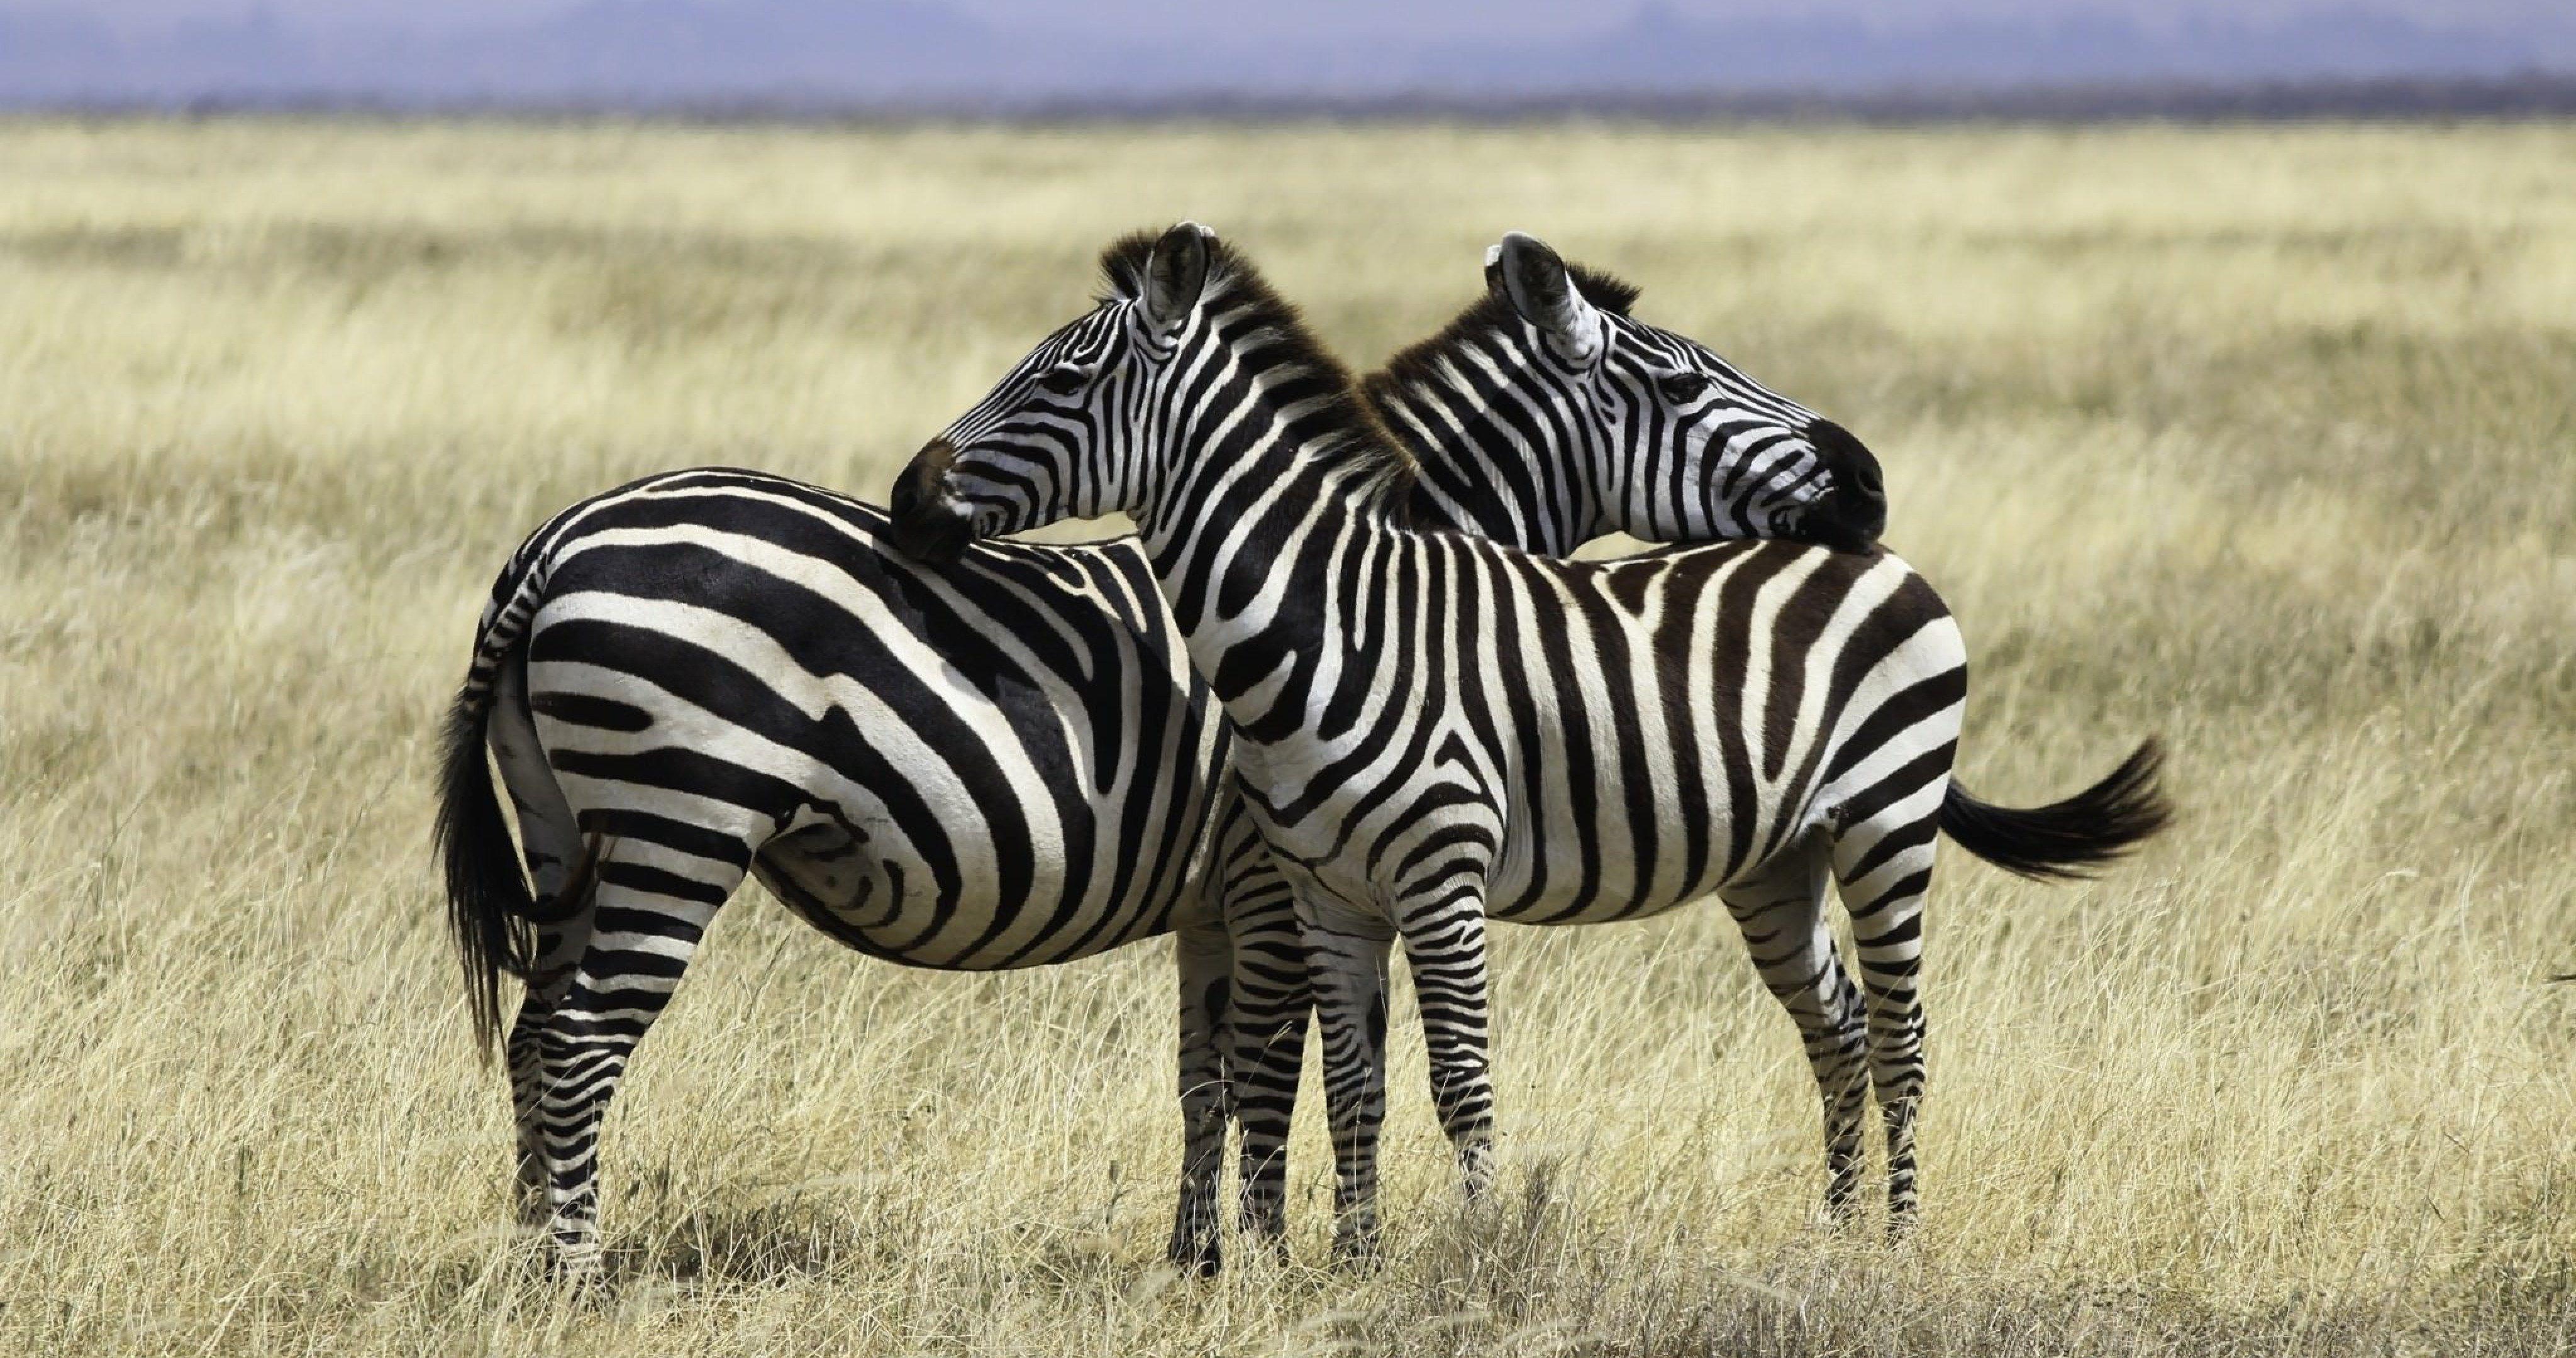 Safari Pair Of Zebras 4k Ultra Hd Wallpaper Zebras Hd Wallpaper